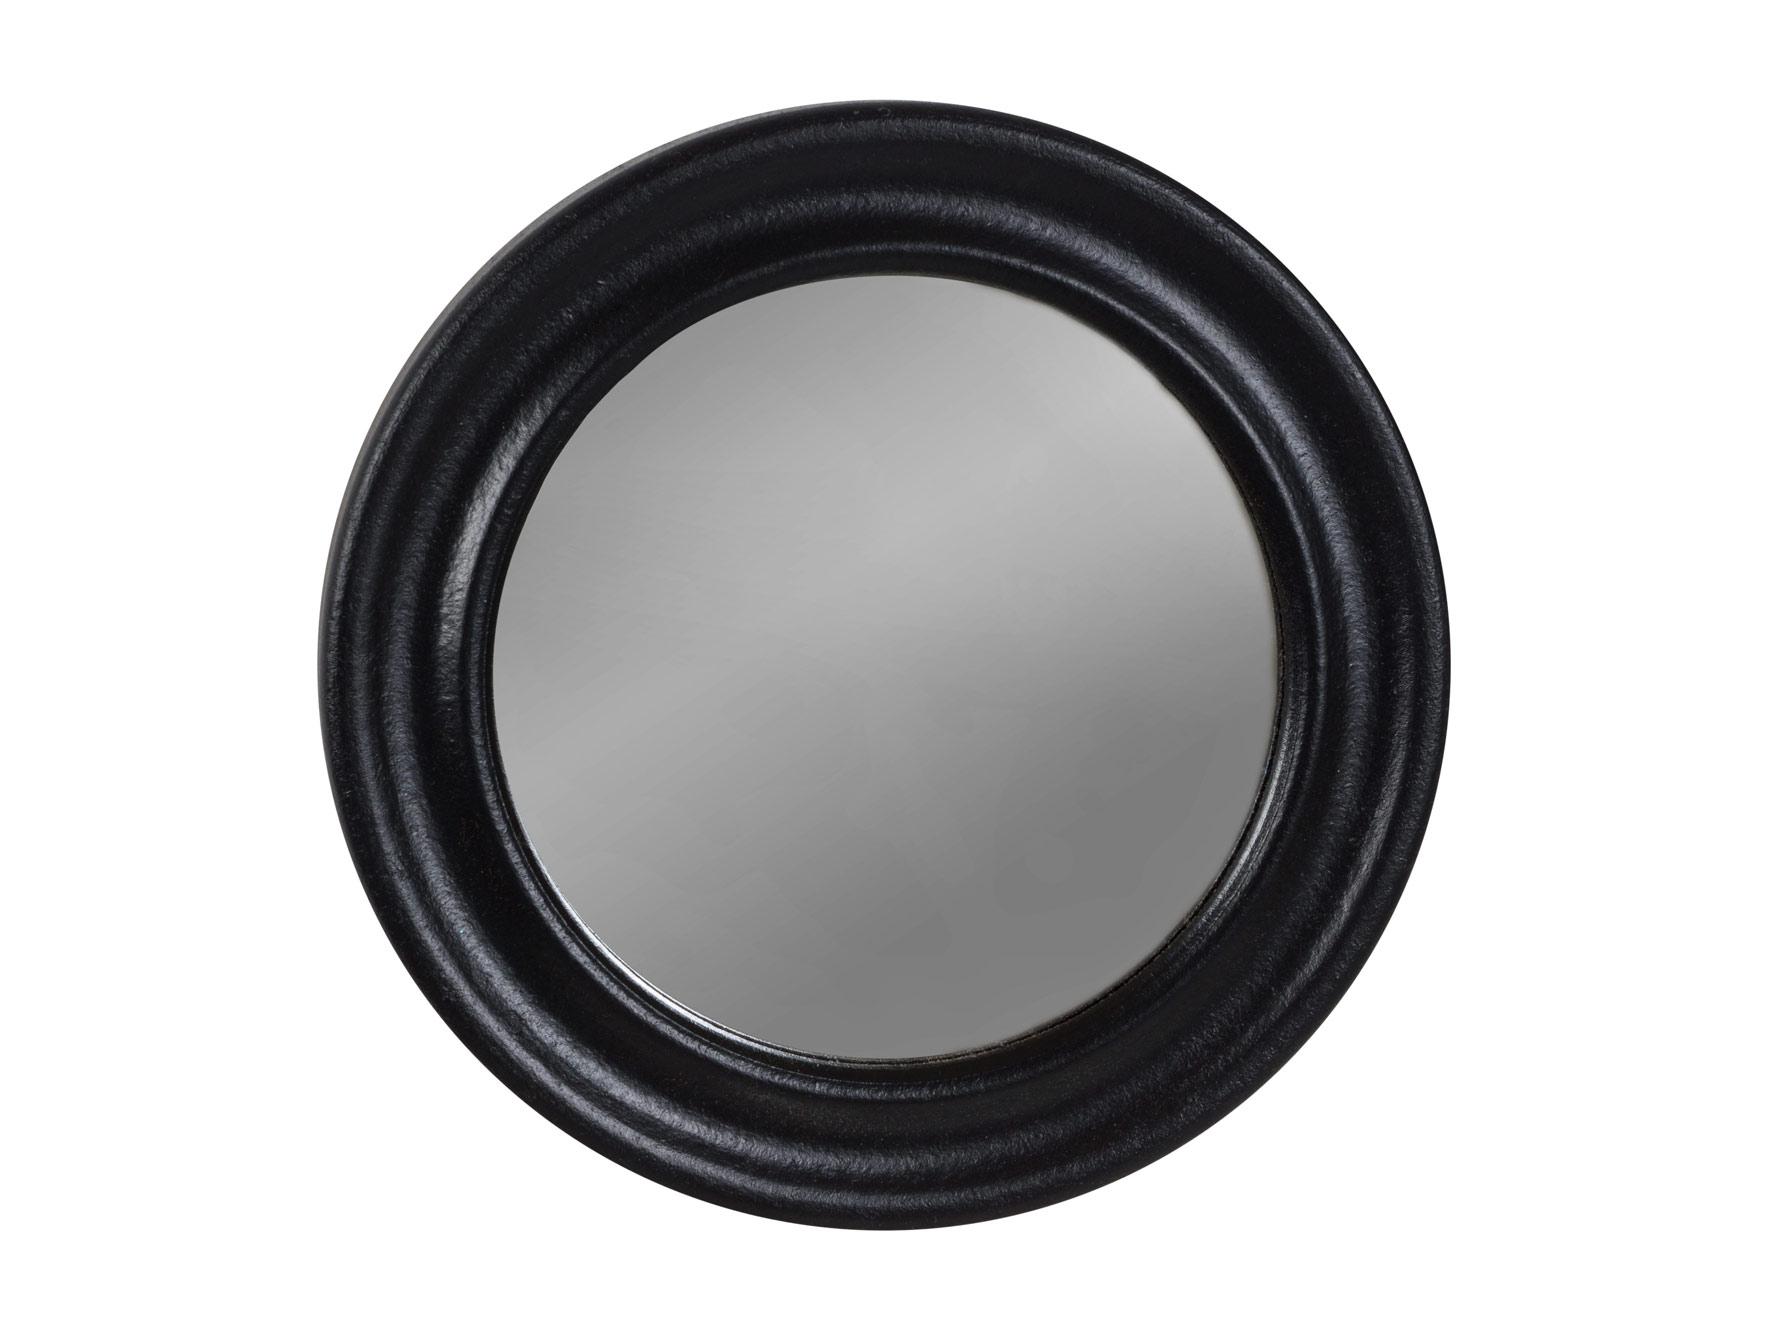 Зеркало Basle черноеЗеркала<br>Зеркало настенное<br>